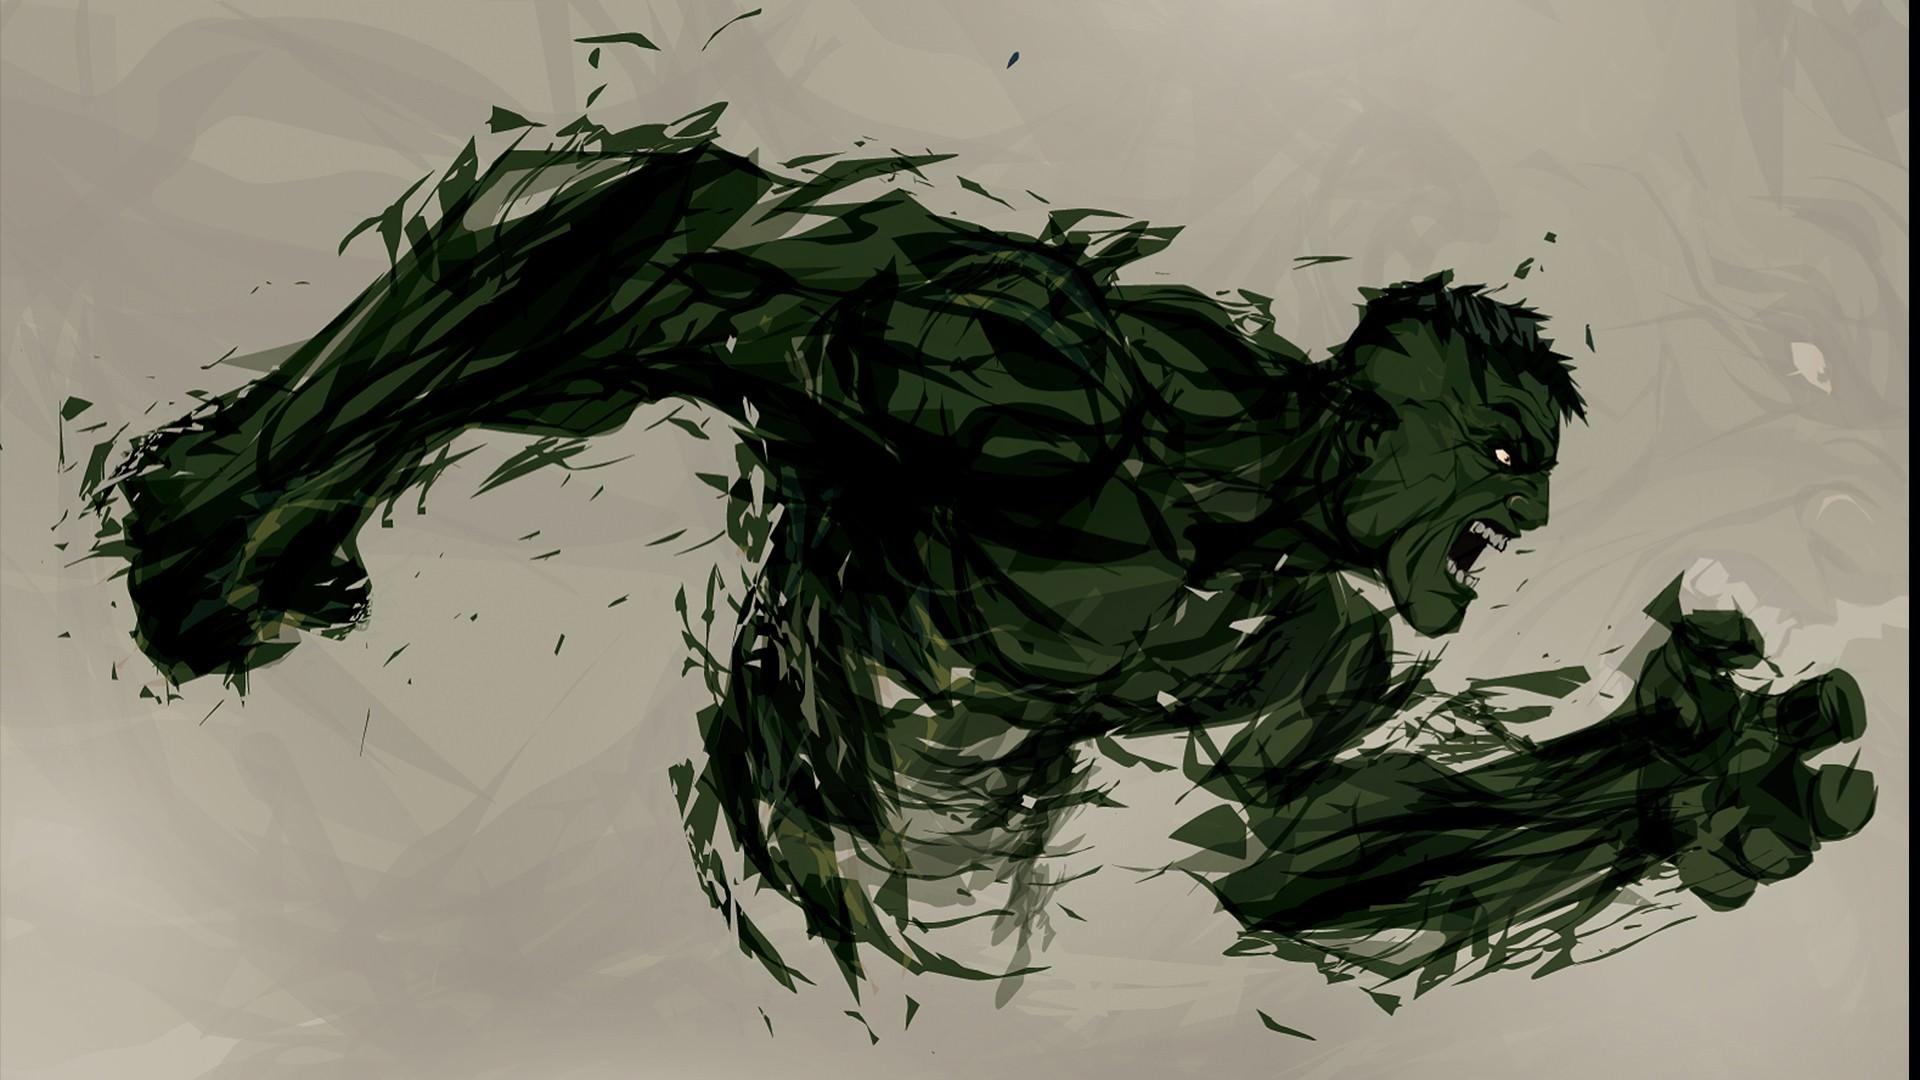 The Hulk Illustrated Alternative Art Wallpaper DigitalArtio 1920x1080